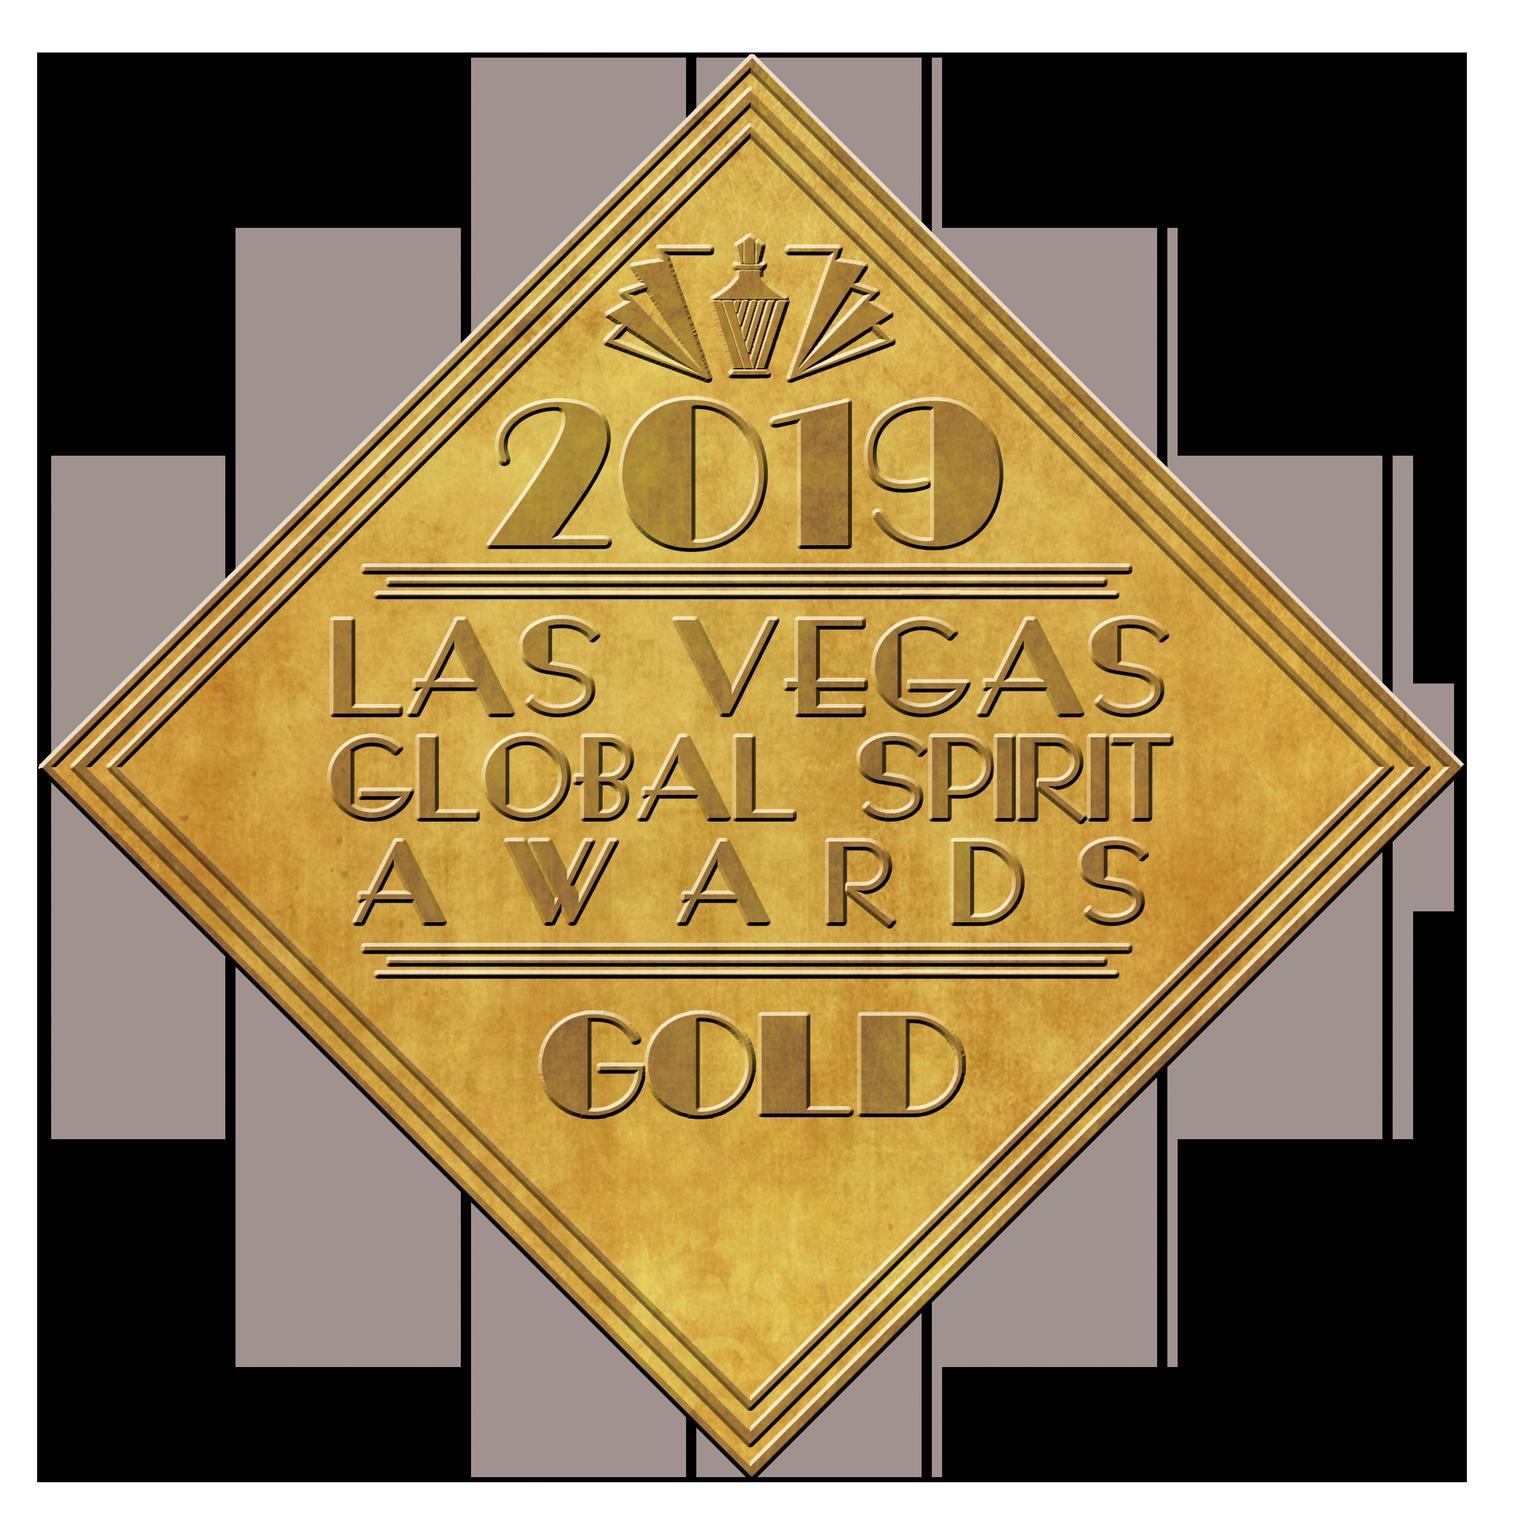 2019-Global-spirit-awards-FNL-gold.png